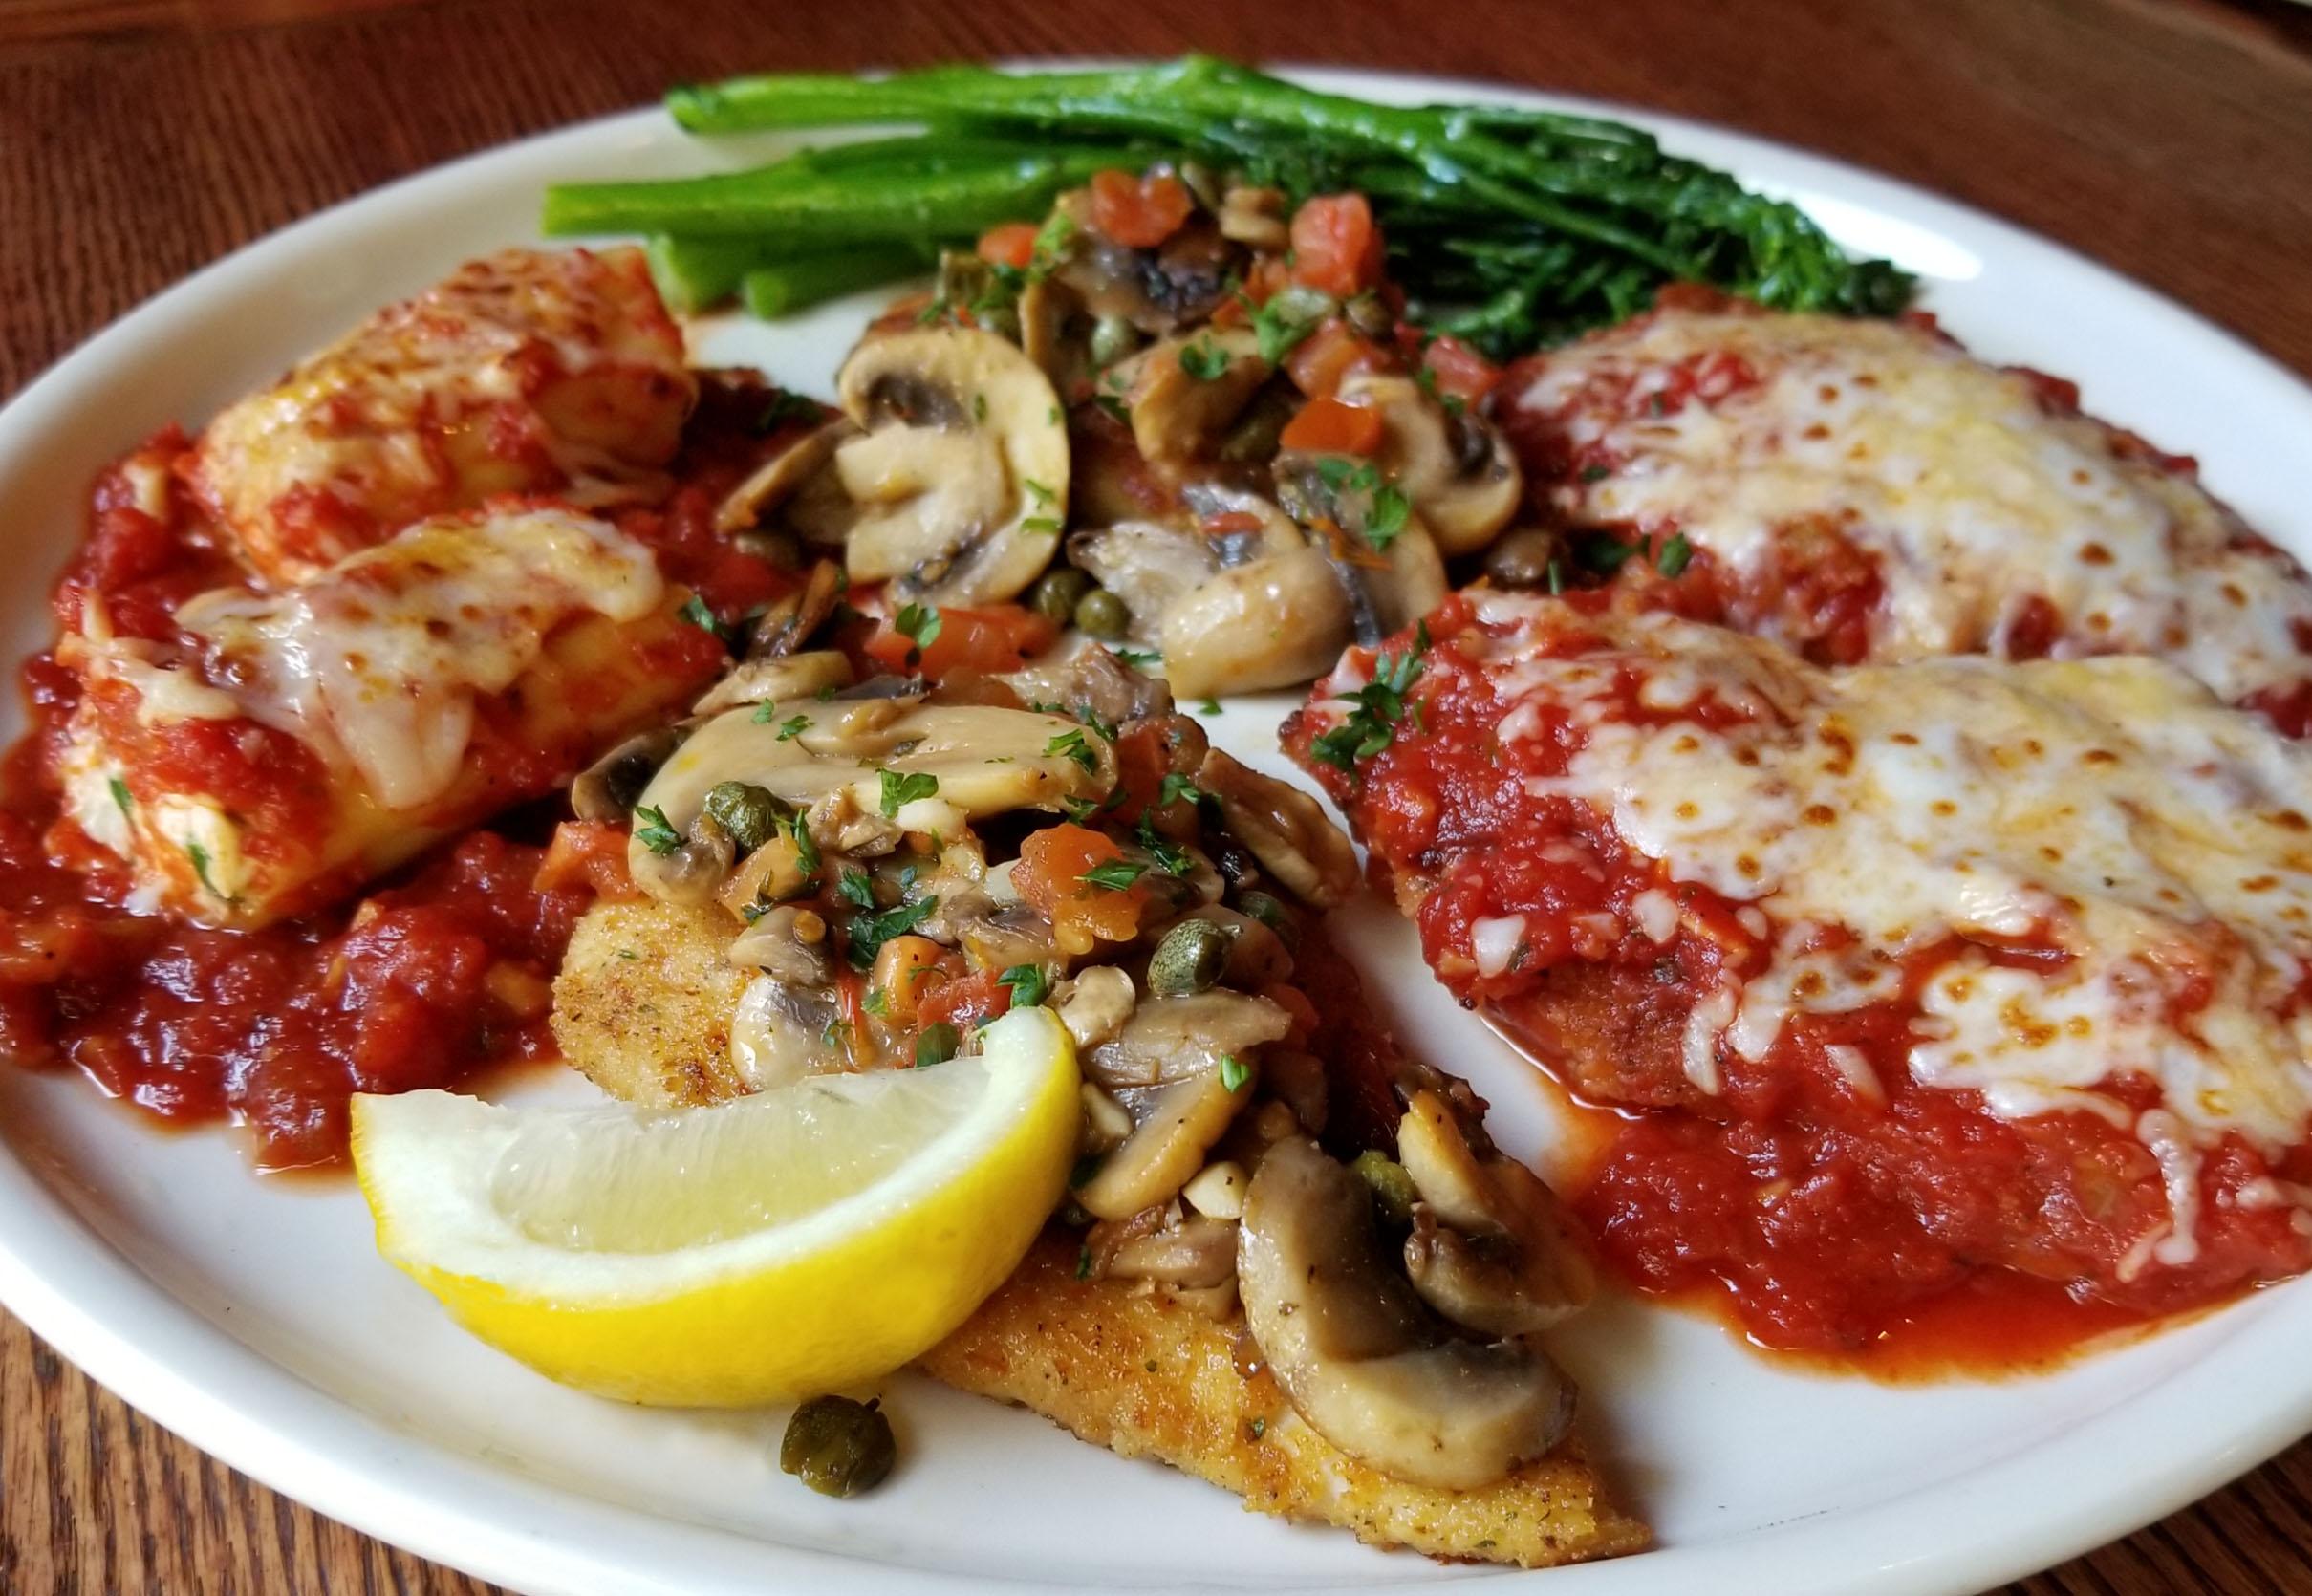 Rigatony S Authentic Italian Restaurant Tempe Az